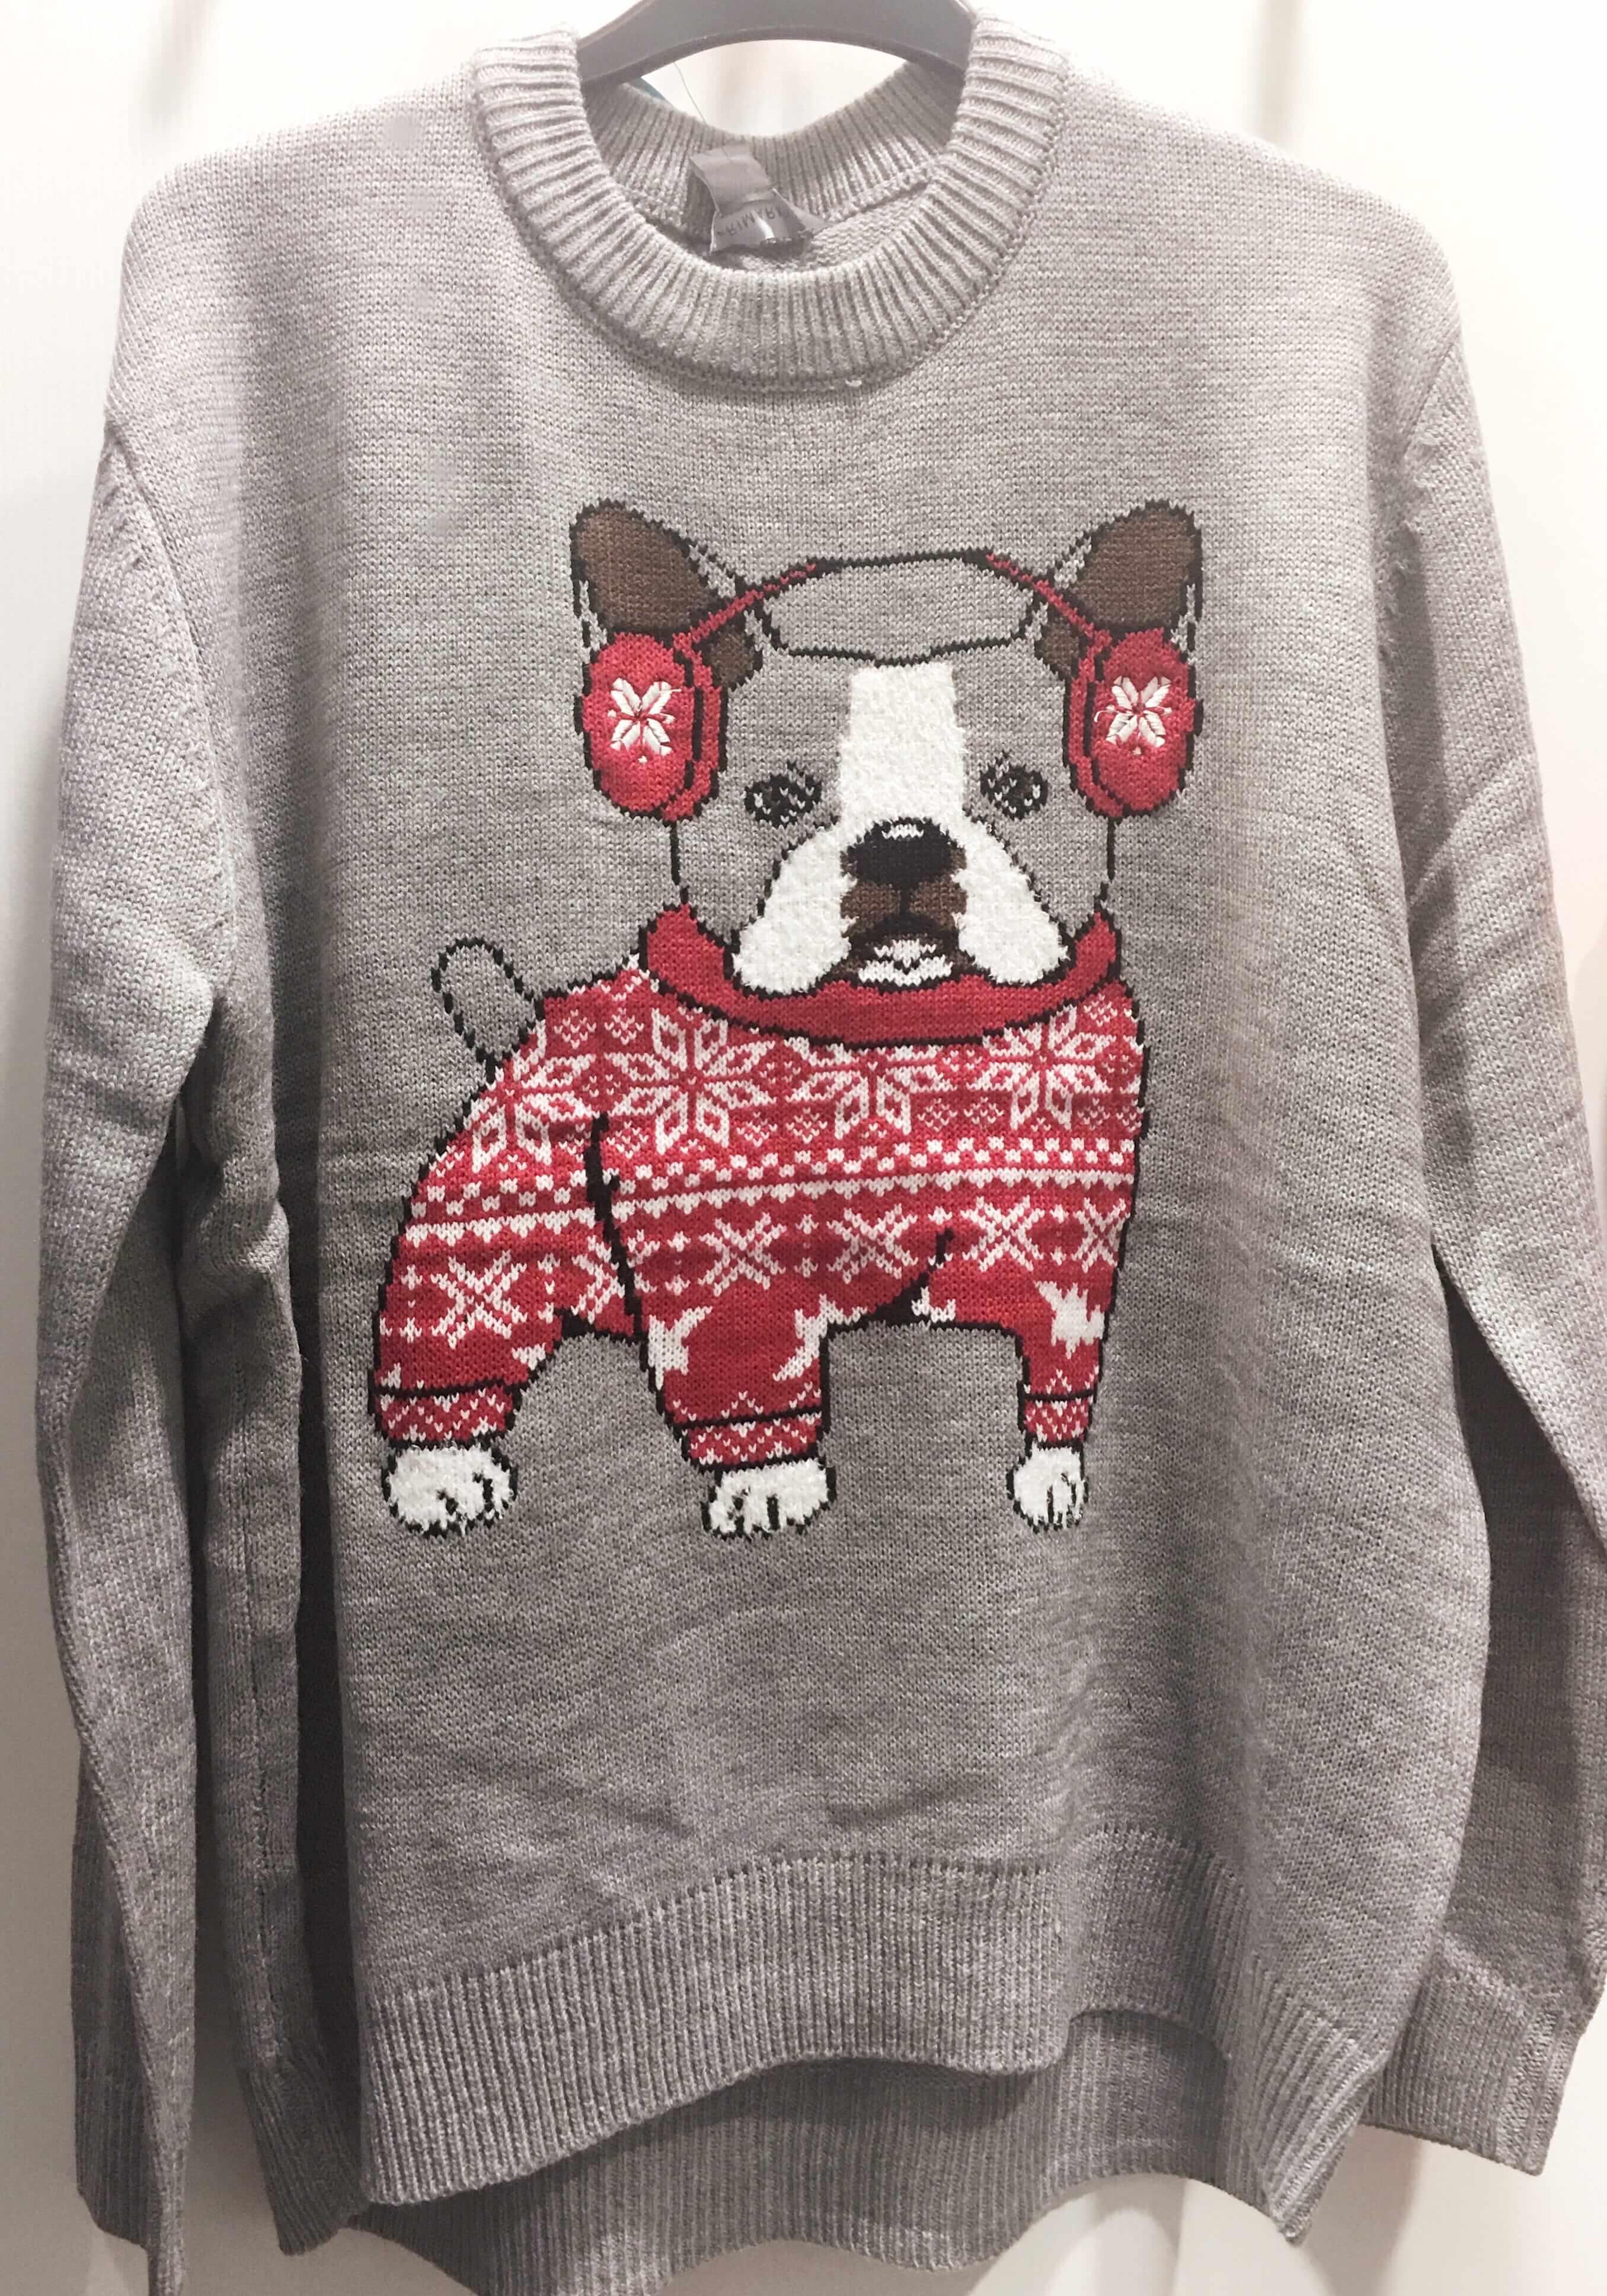 French Bulldog Christmas Jumper.Christmas Jumper Inspiration For 2018 From The Bridges